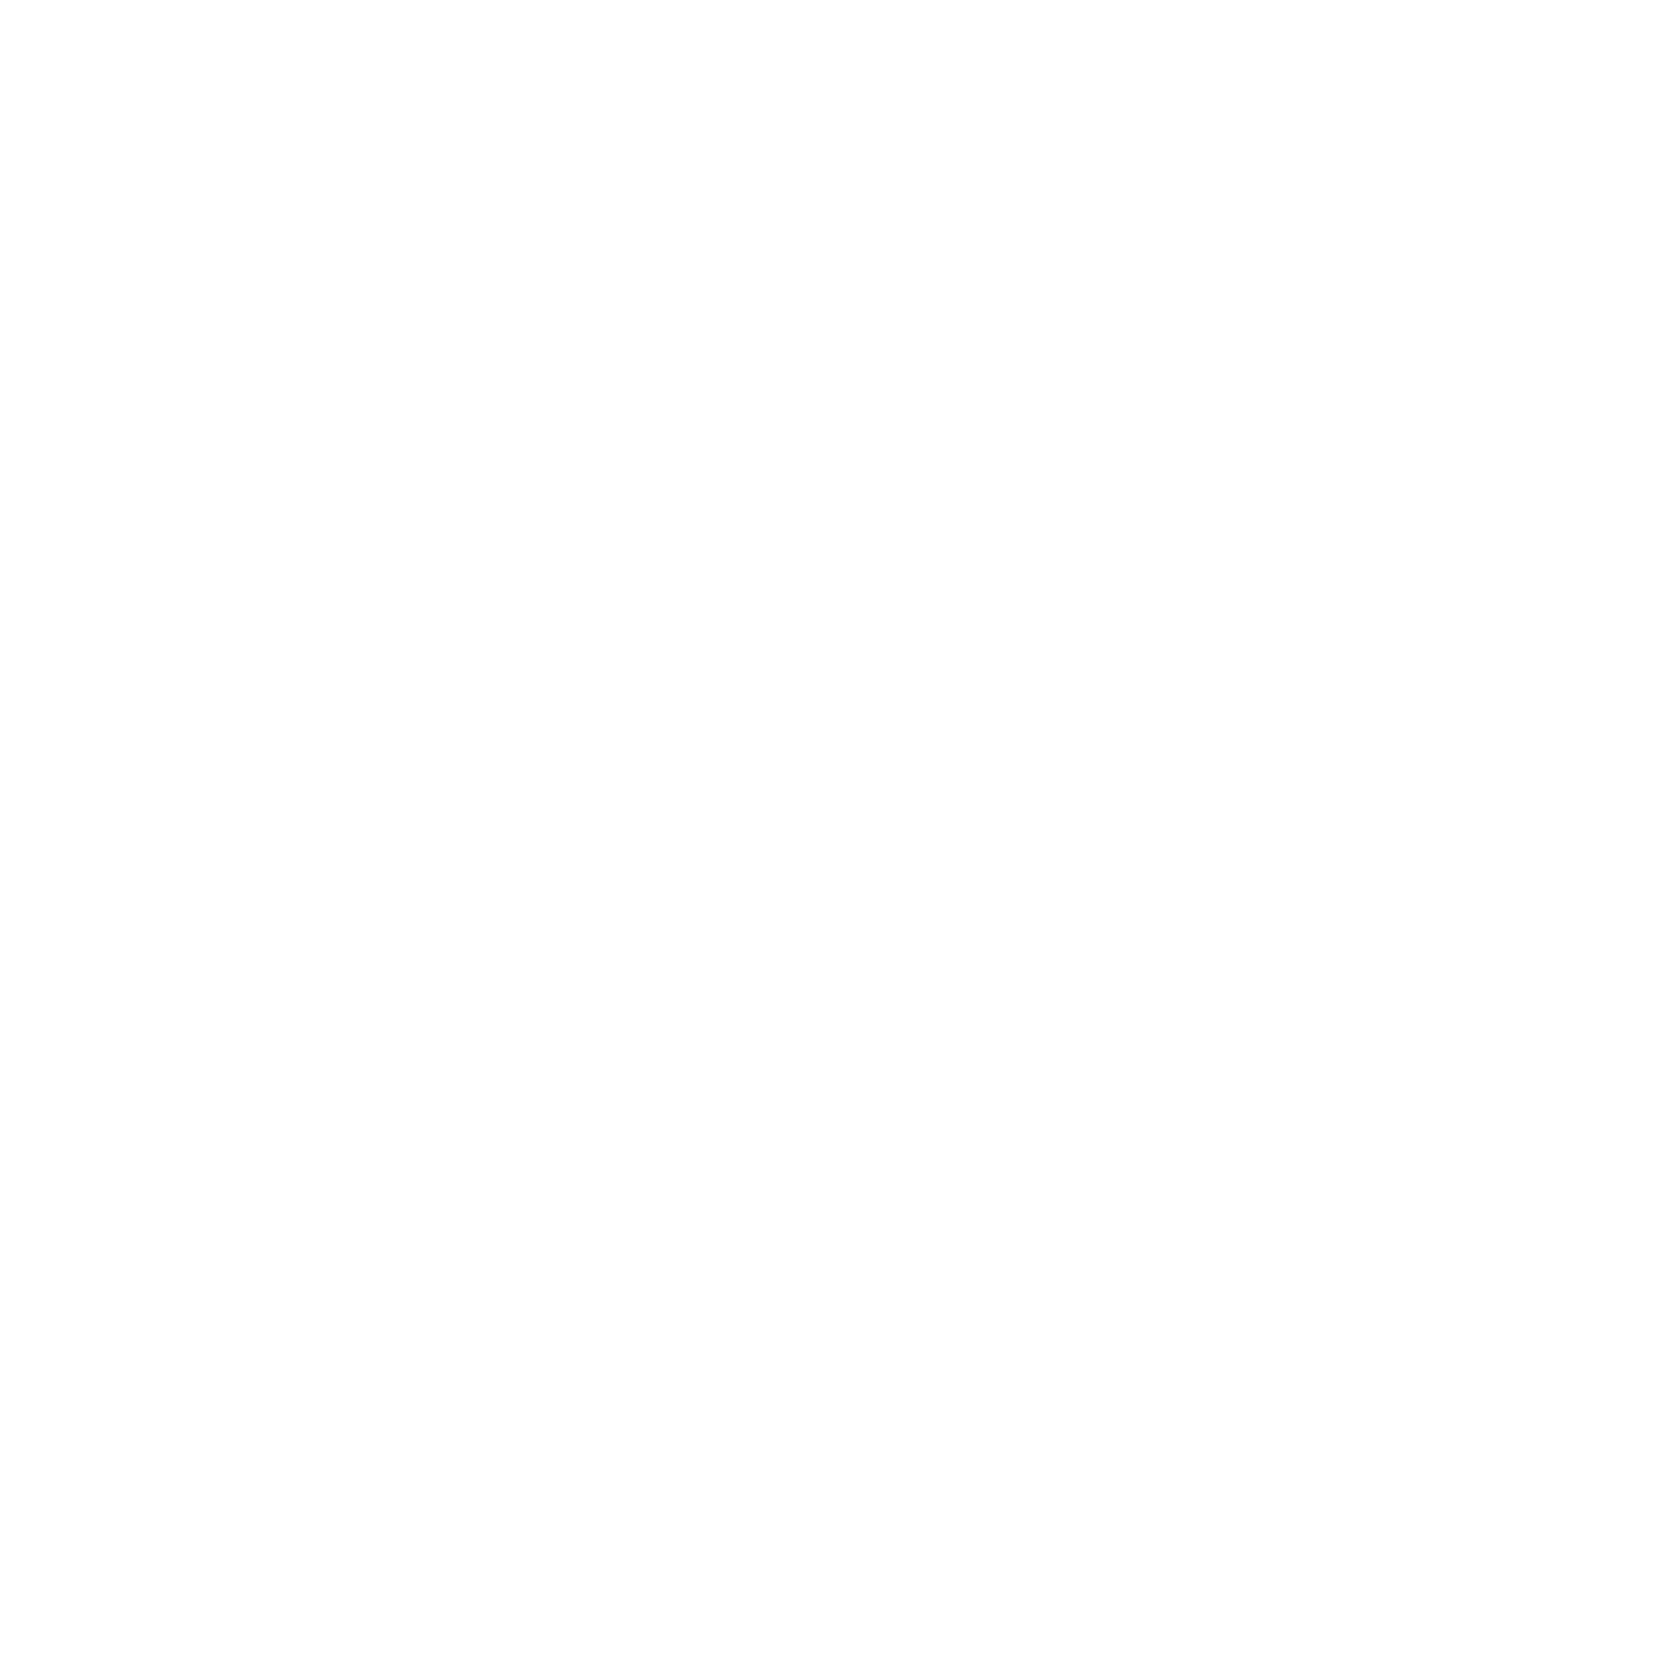 Benefit-Enrollment-Icon